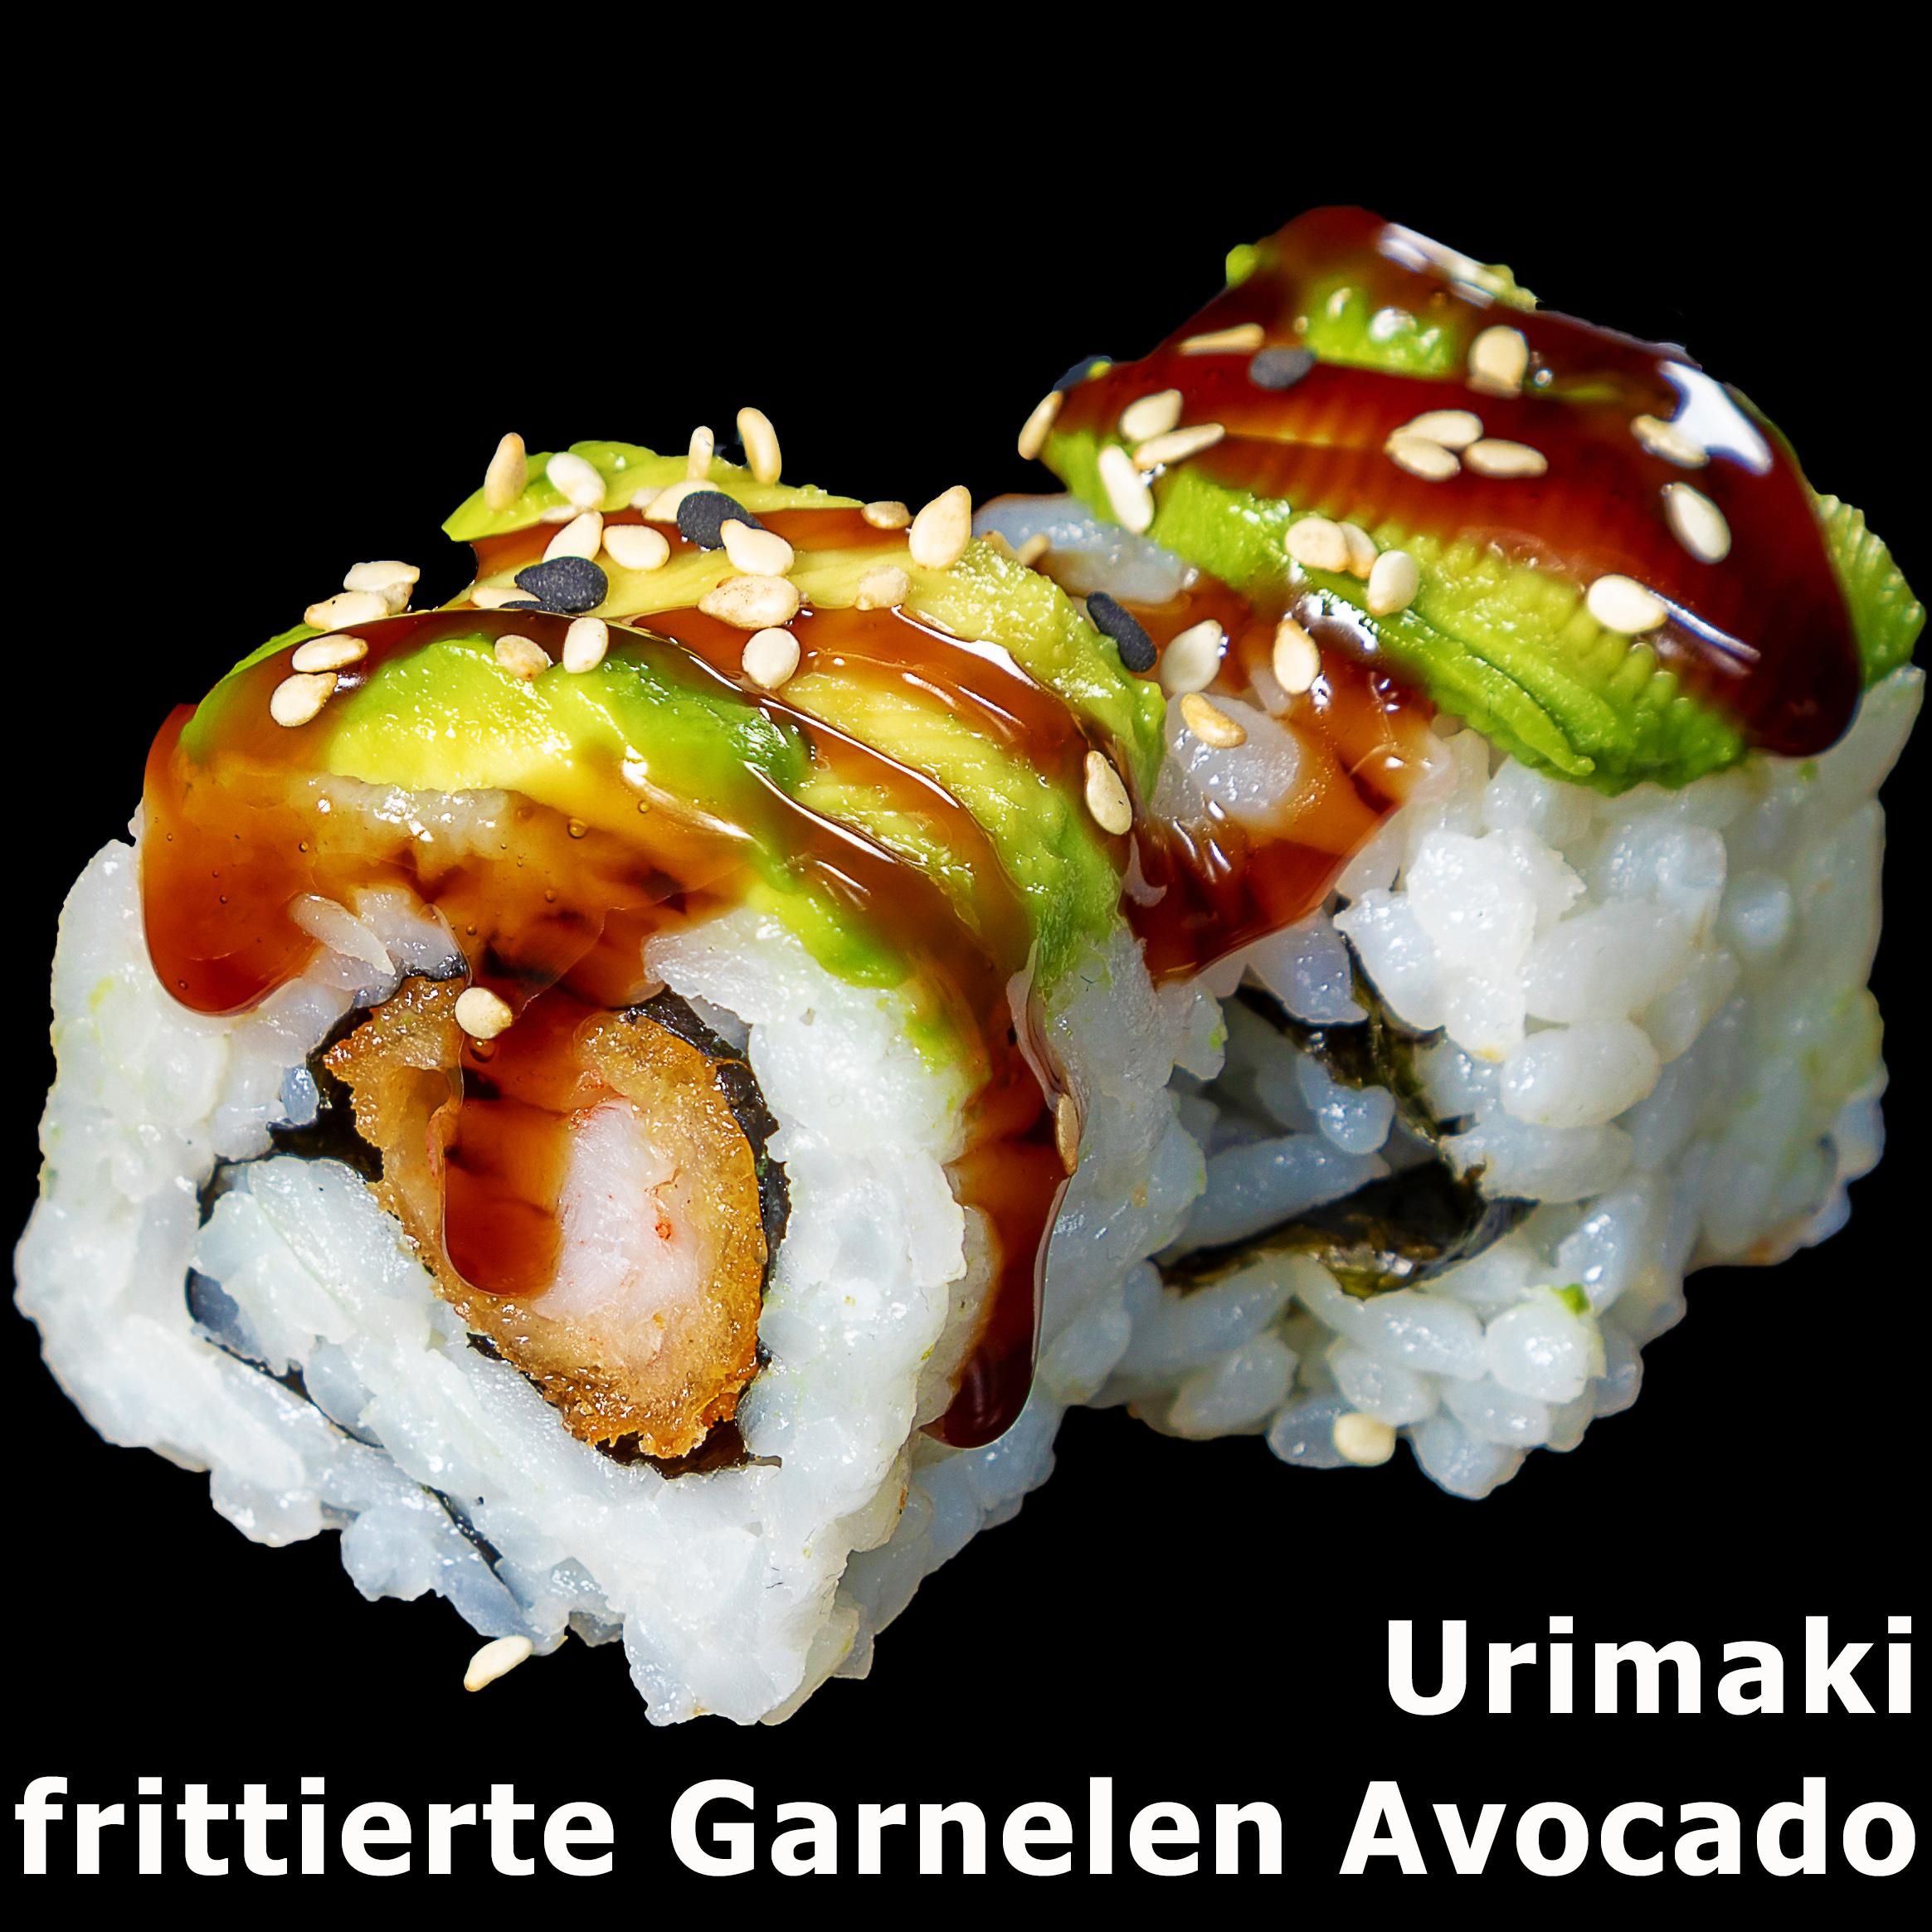 33. Urimaki frittierte Garnelen Avocado